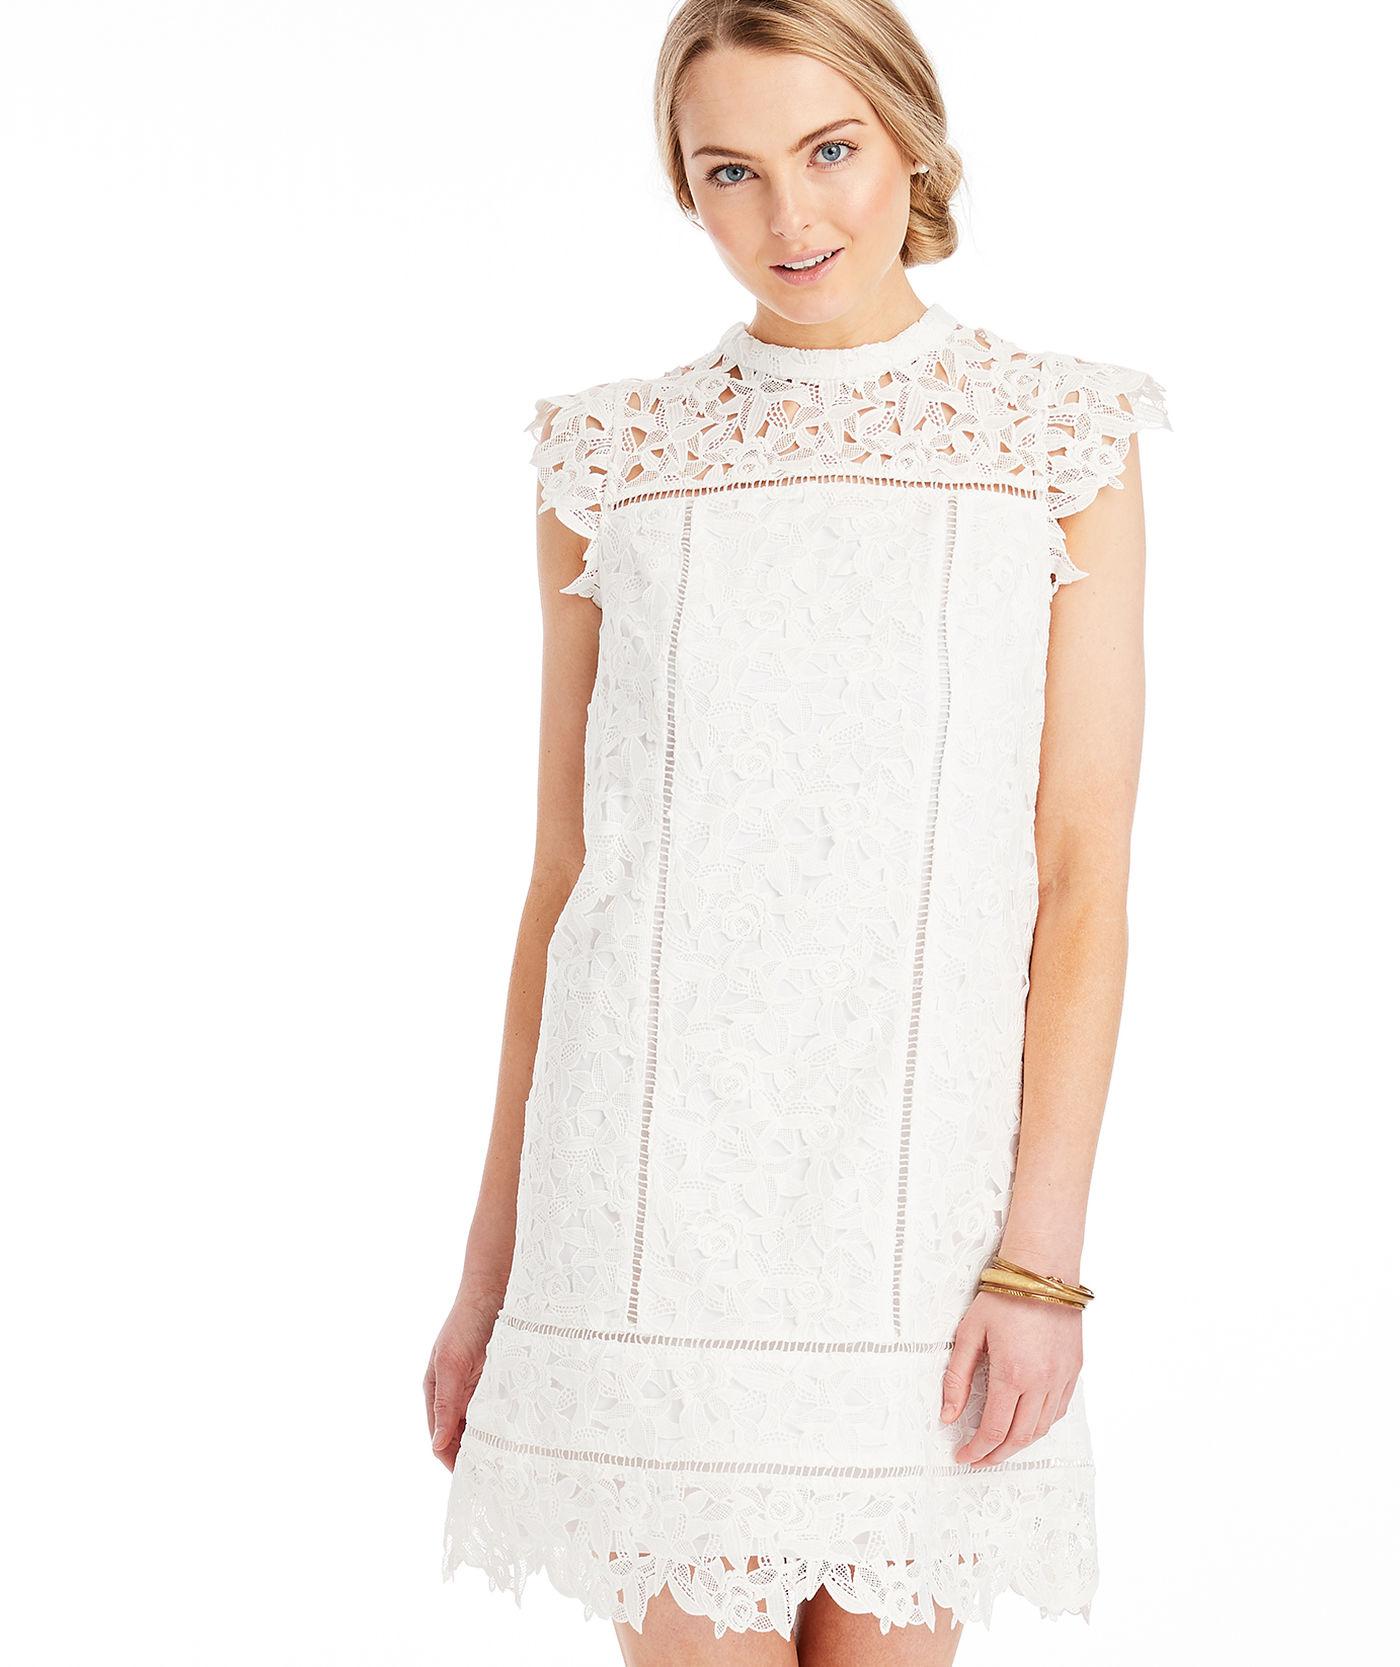 Vineyard Vines Lace Shift Dress